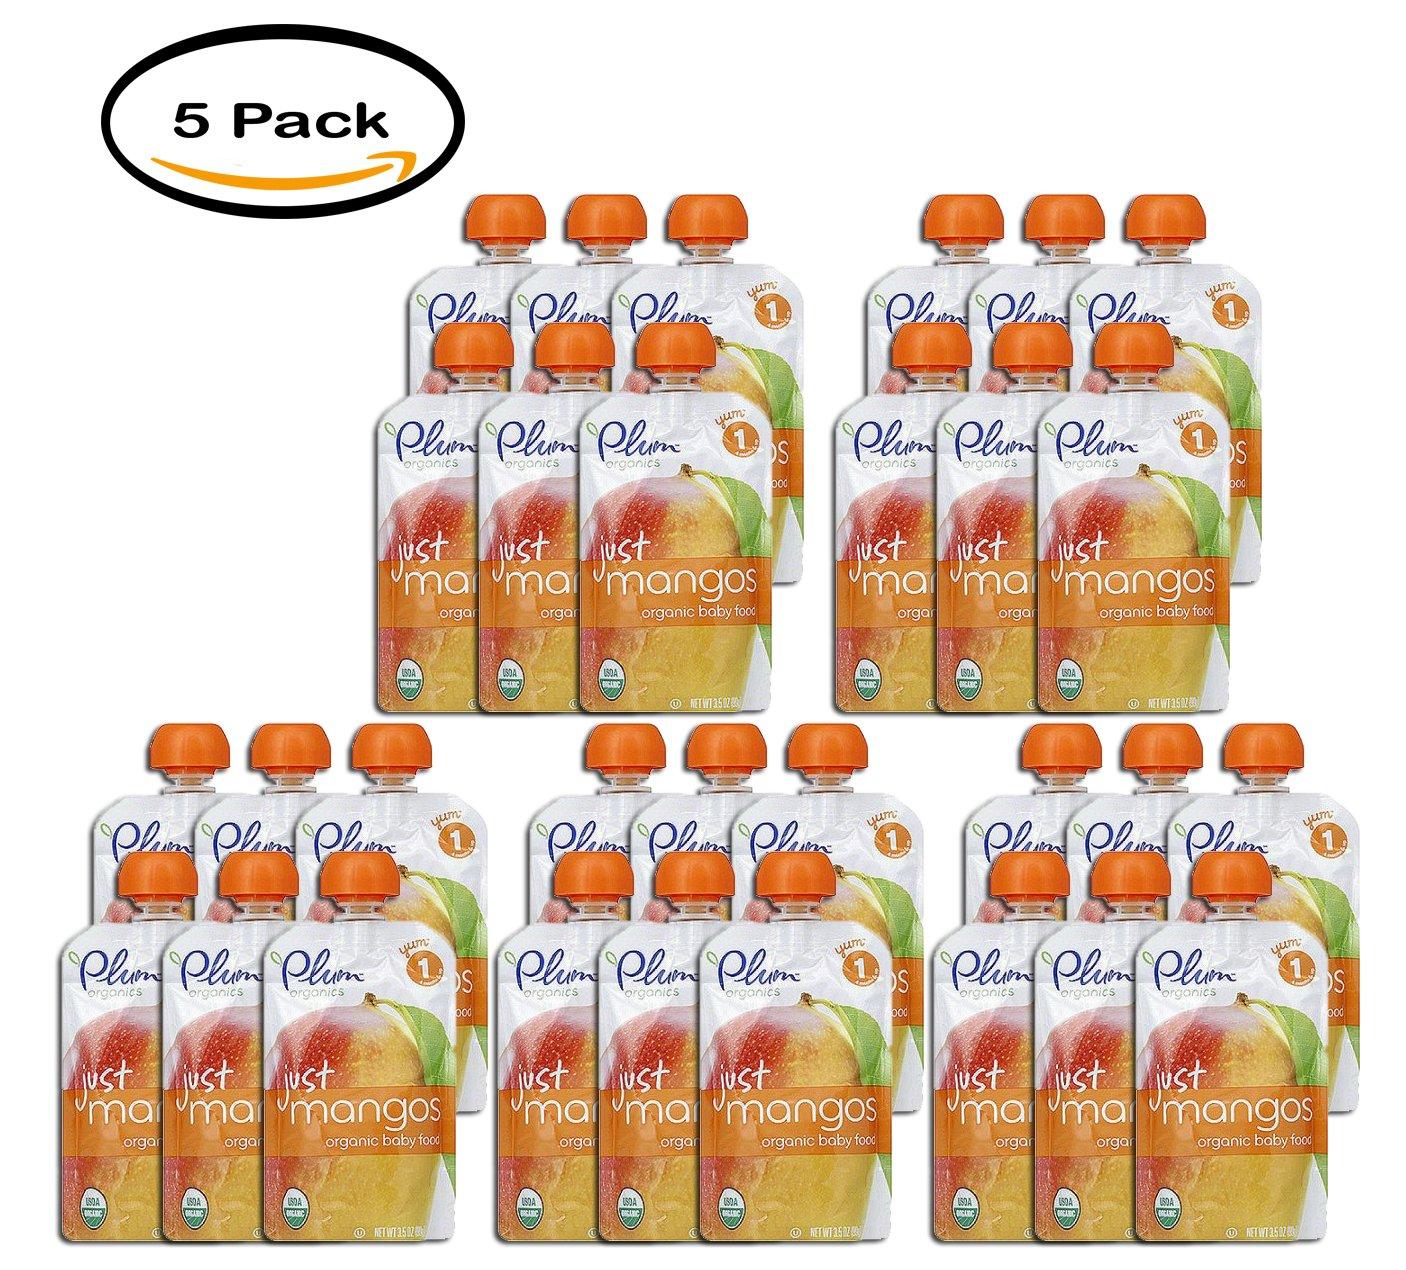 PACK OF 5 - Plum Organics Just Mangos Organic Baby Food, 3.5 oz, (6 count)